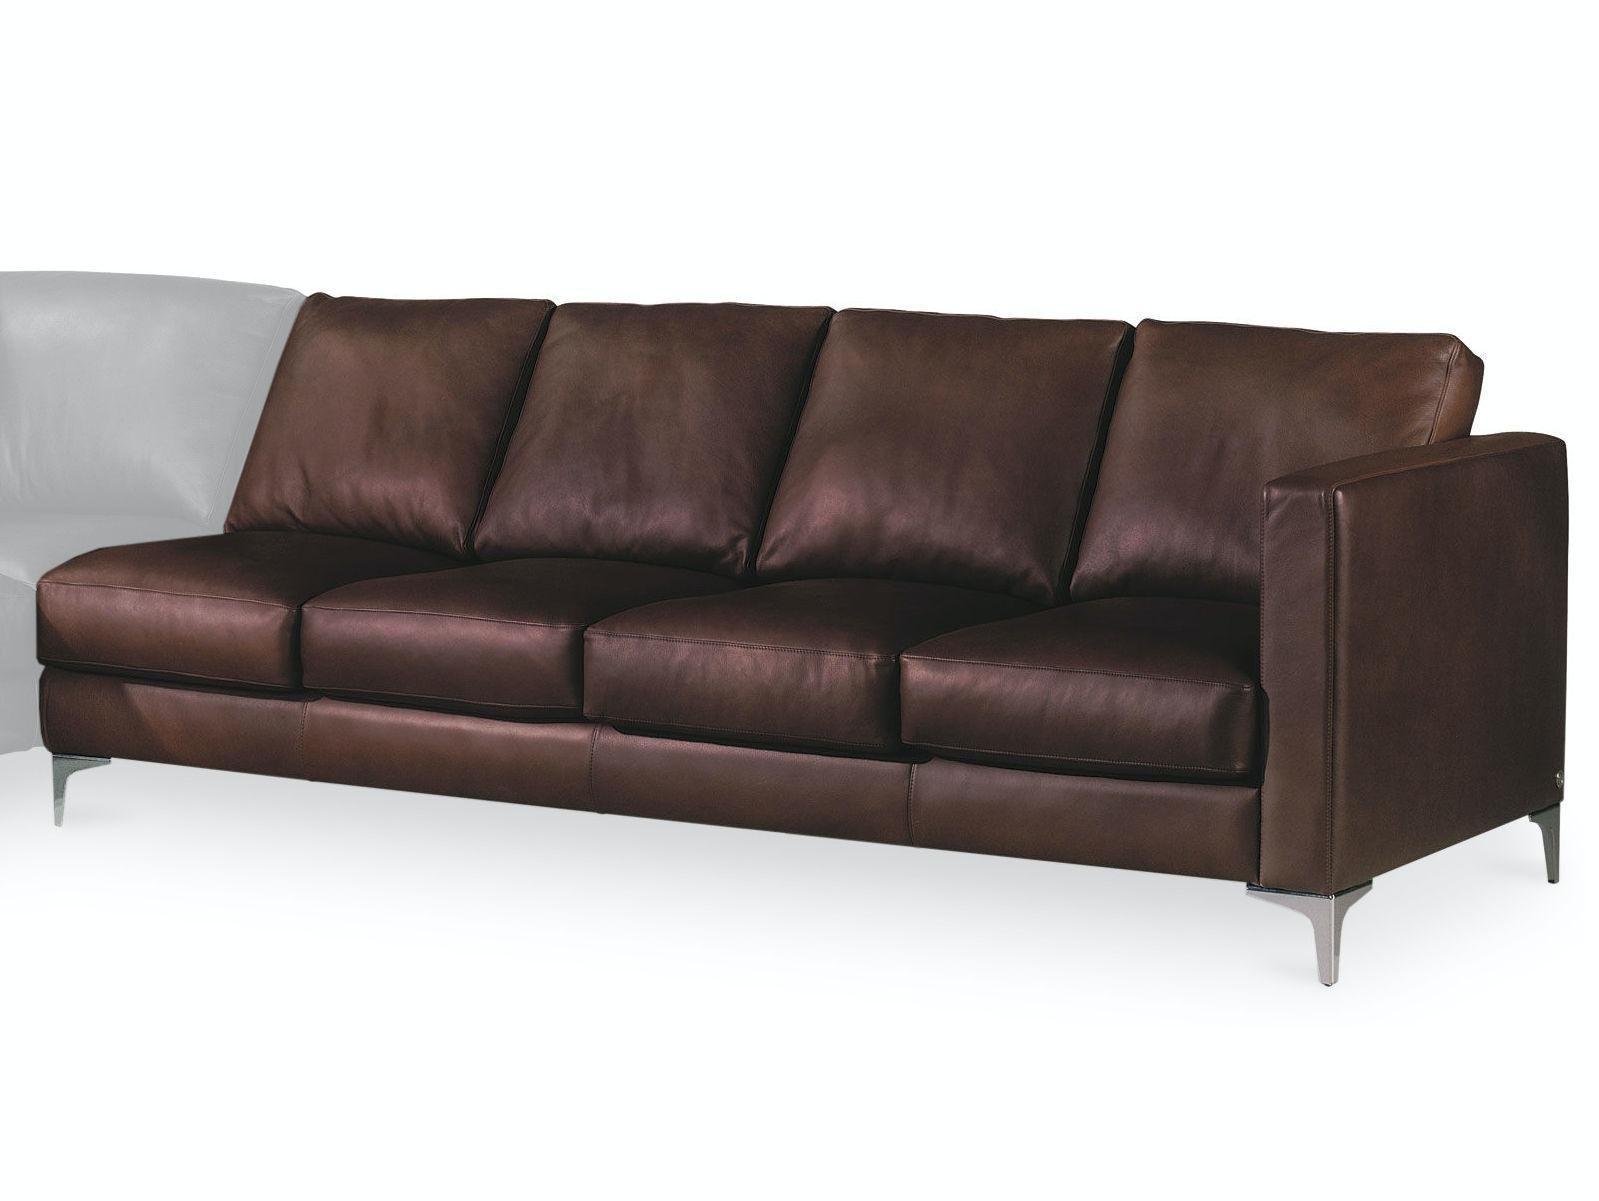 Charmant American Leather Left Arm Four Cushion Sofa AMLKNDSO4LA From Walter E.  Smithe Furniture + Design